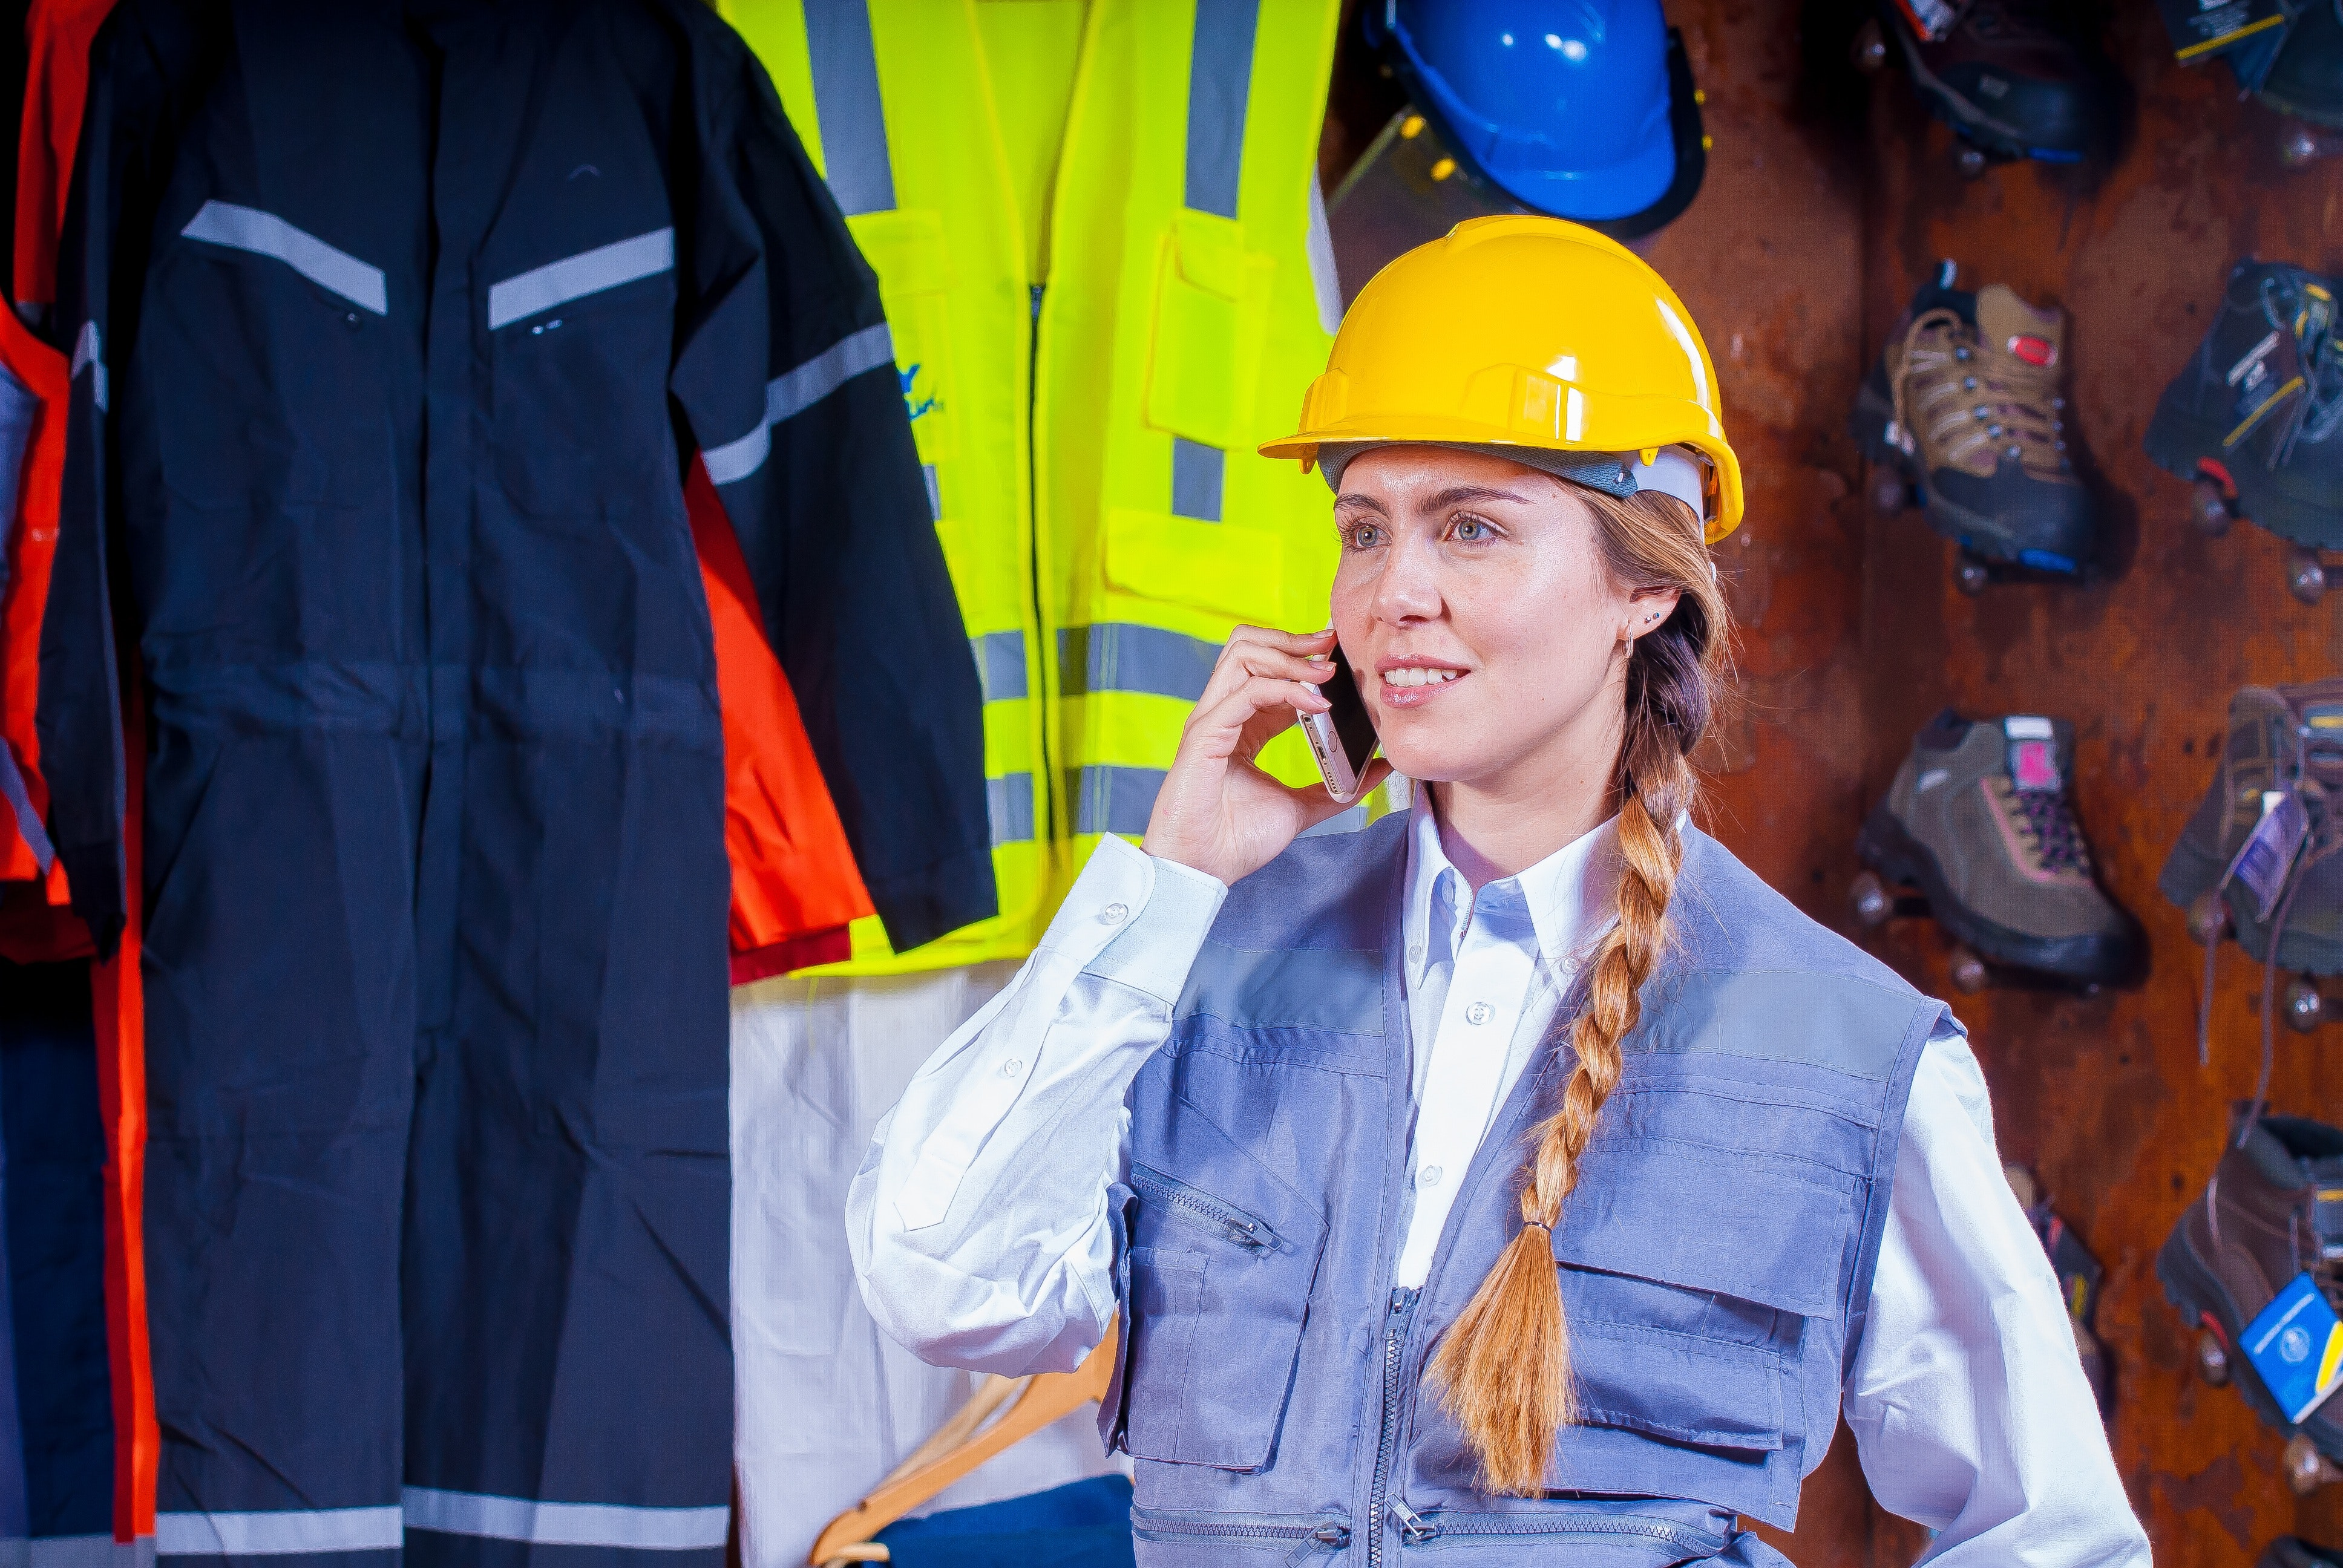 OSHA Inspections – $9.95